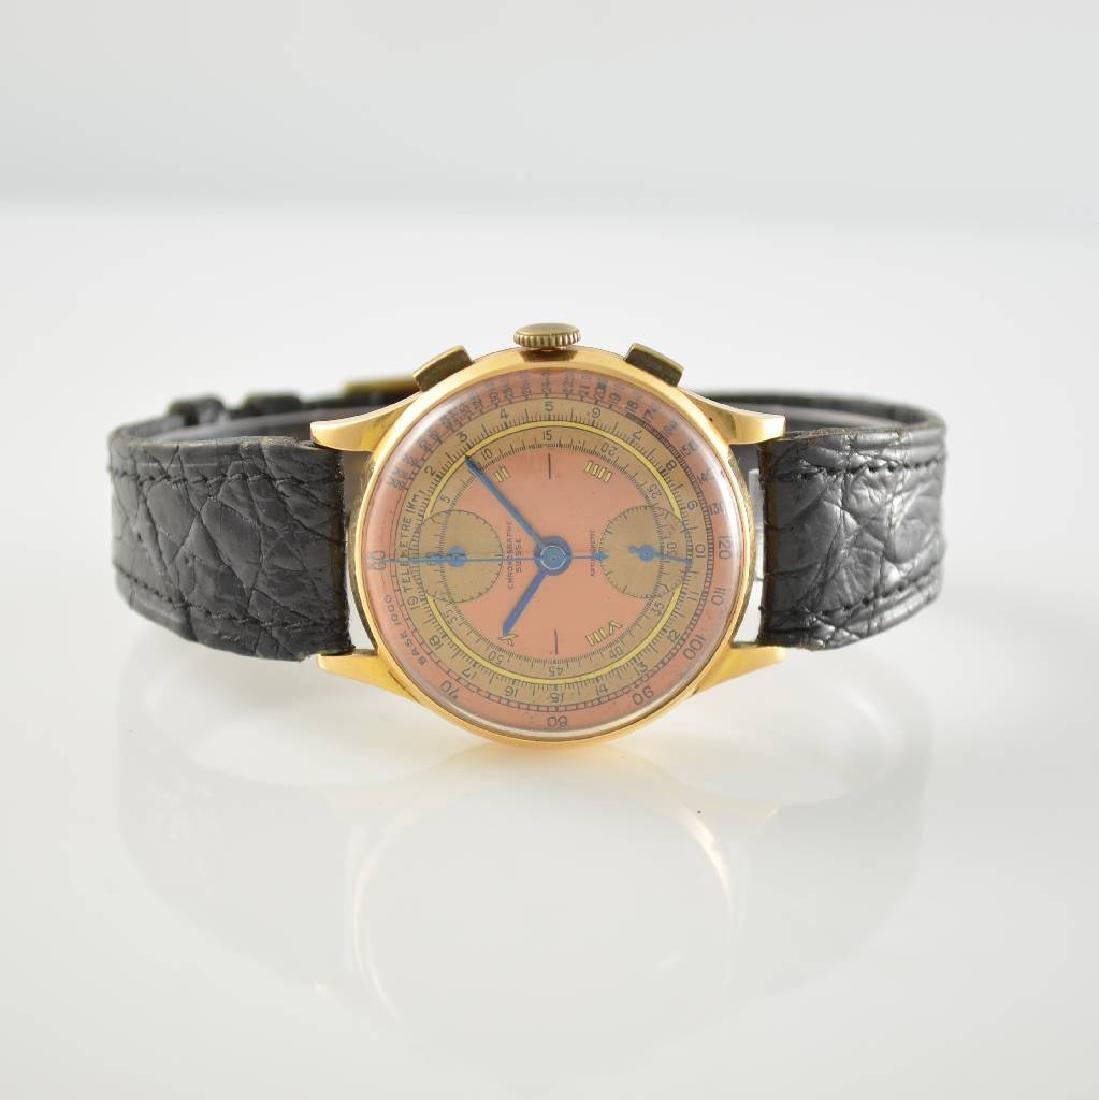 CHRONOGRAPHE SUISSE 18k gold intermediate wheel